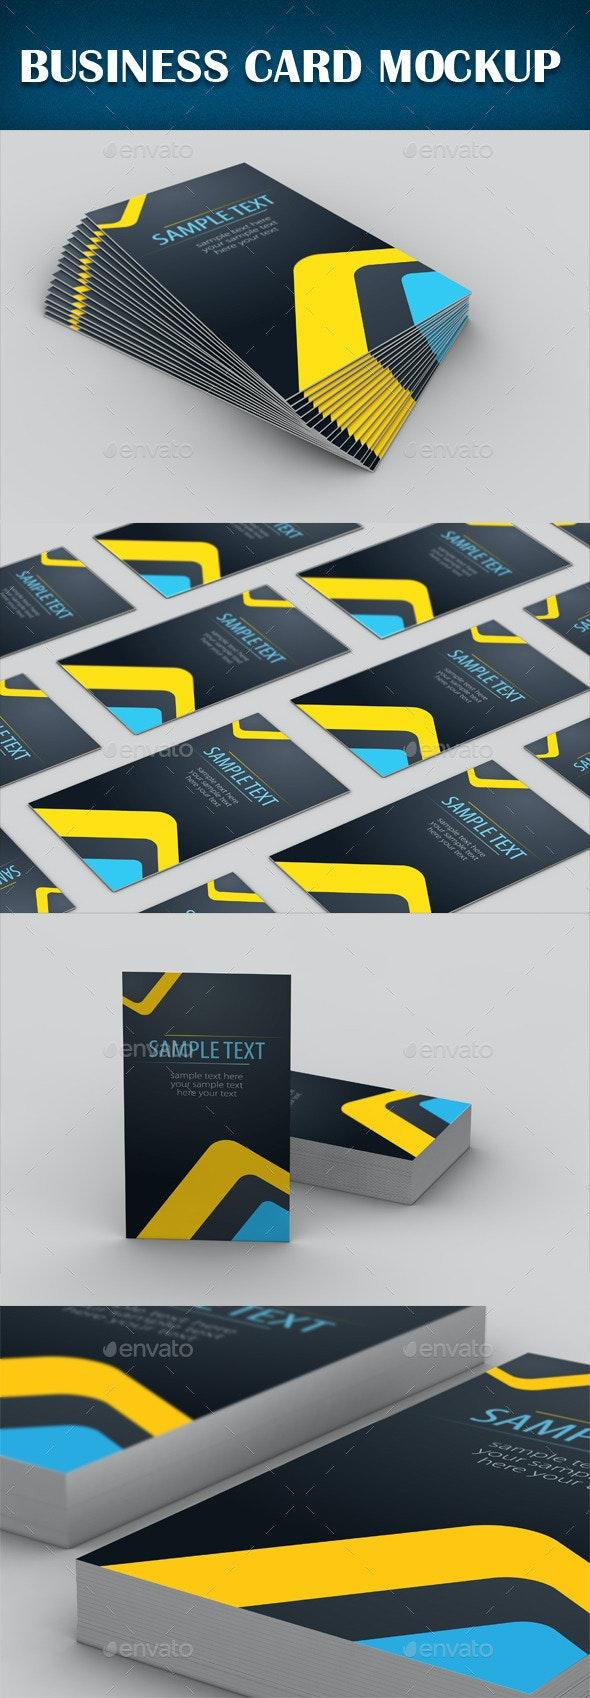 Business Card Mockup - Product Mock-Ups Graphics